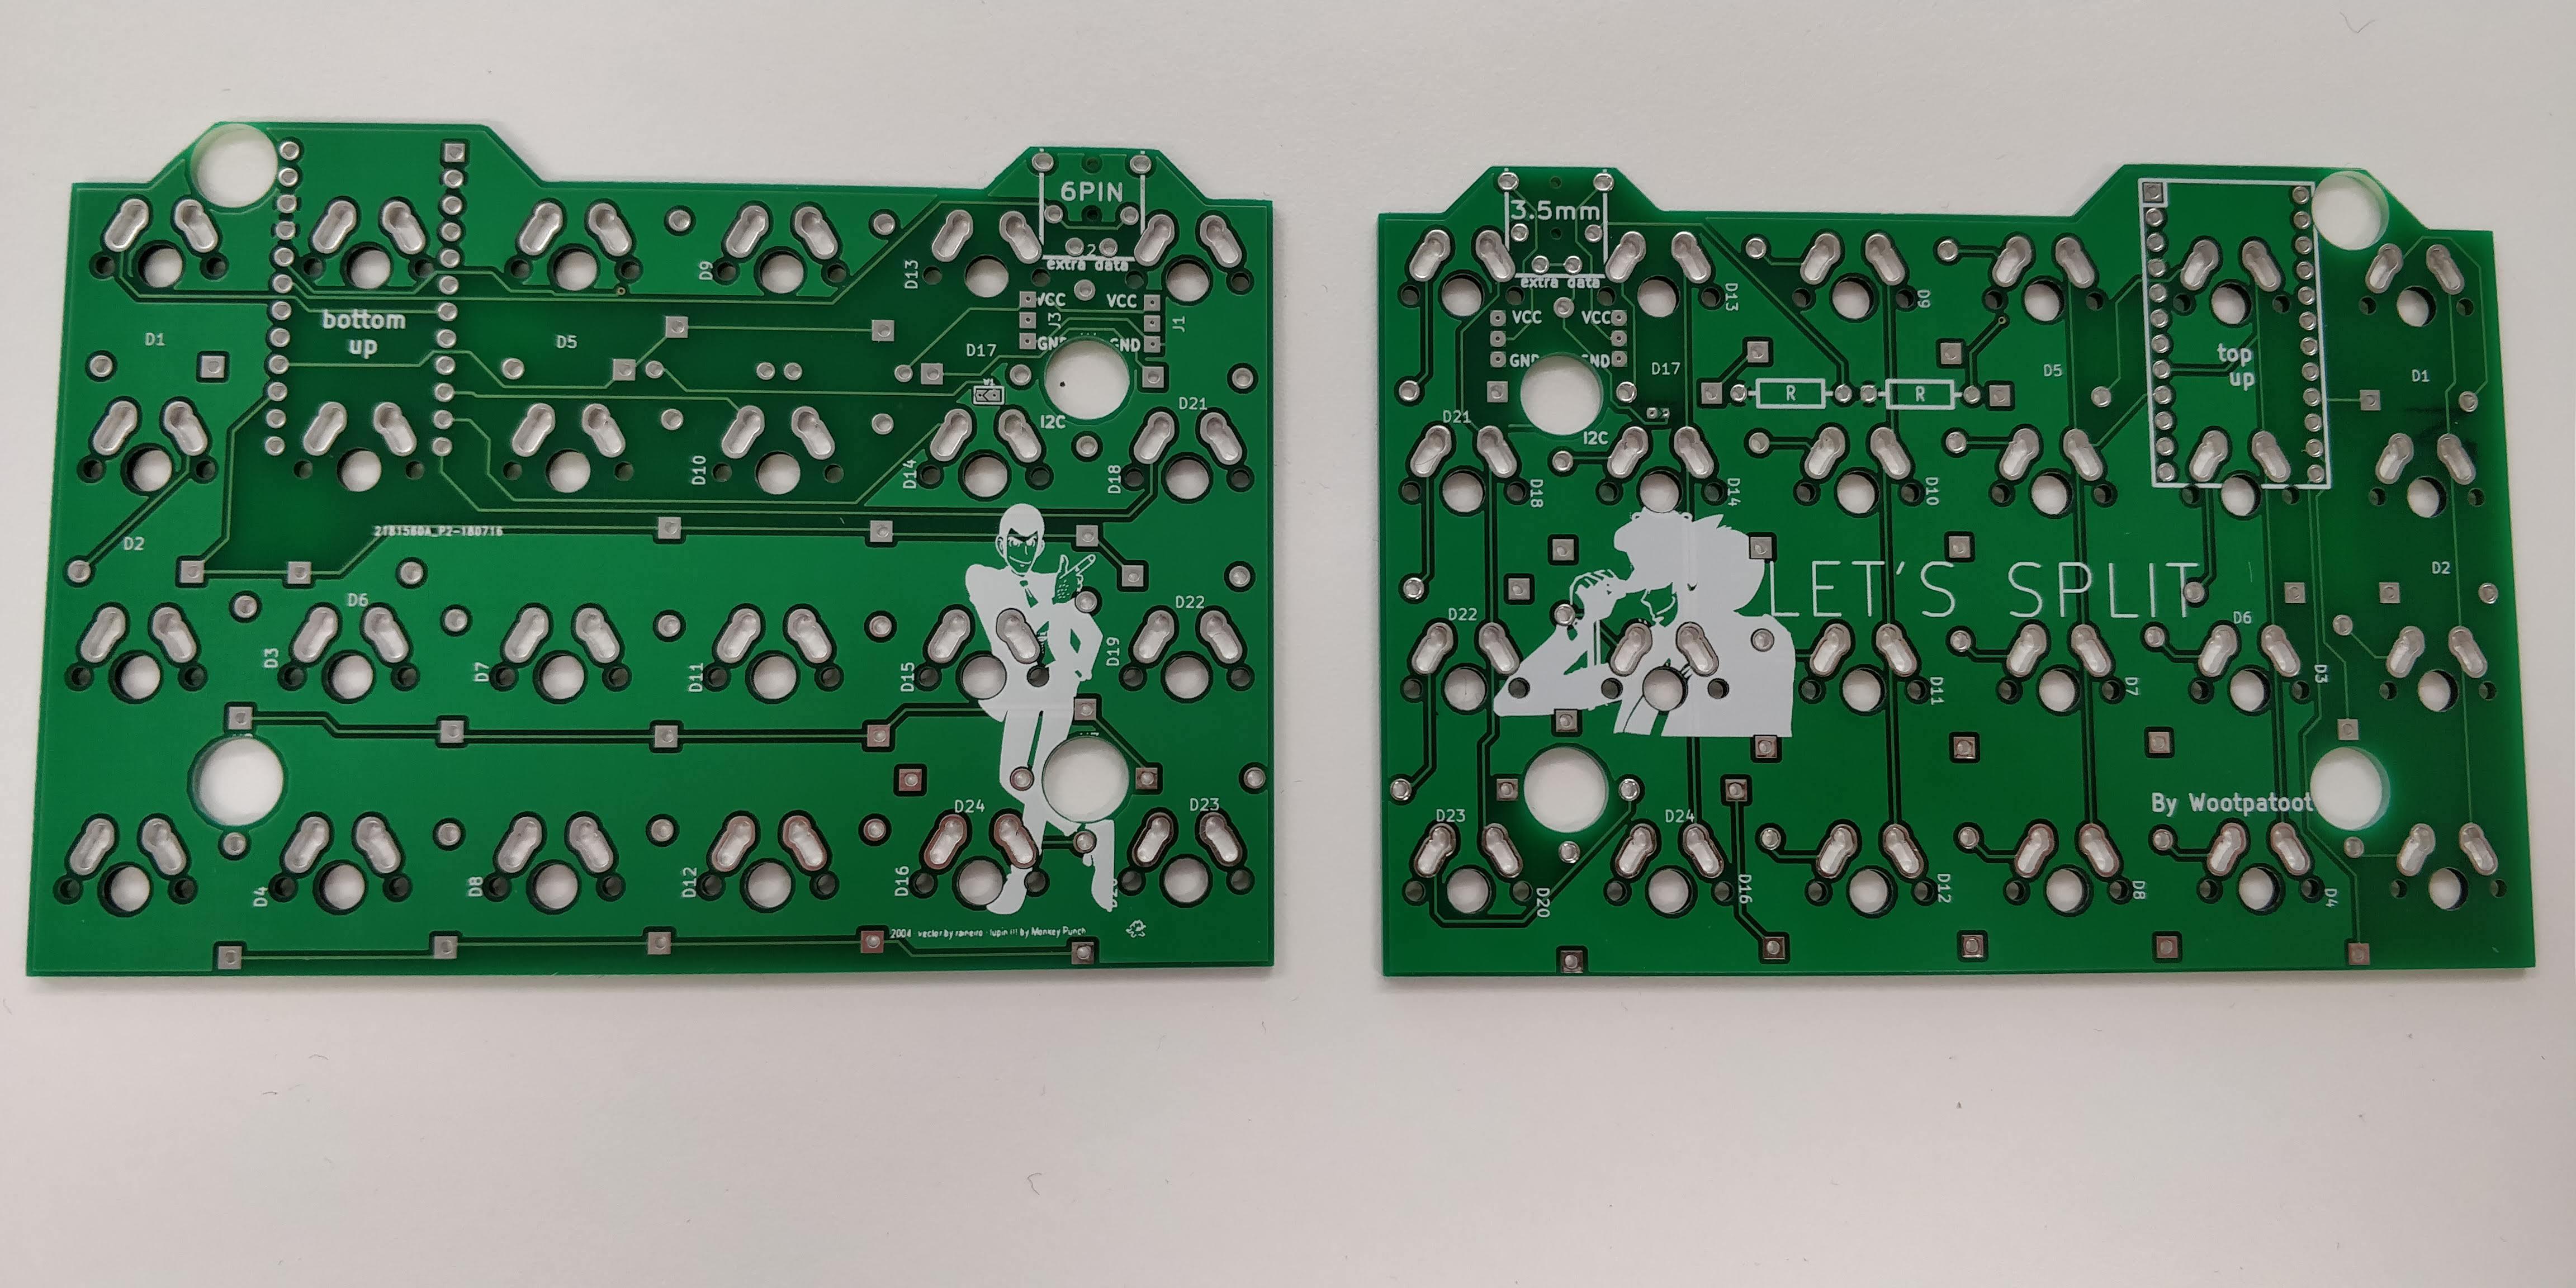 Let's Split - PCBs